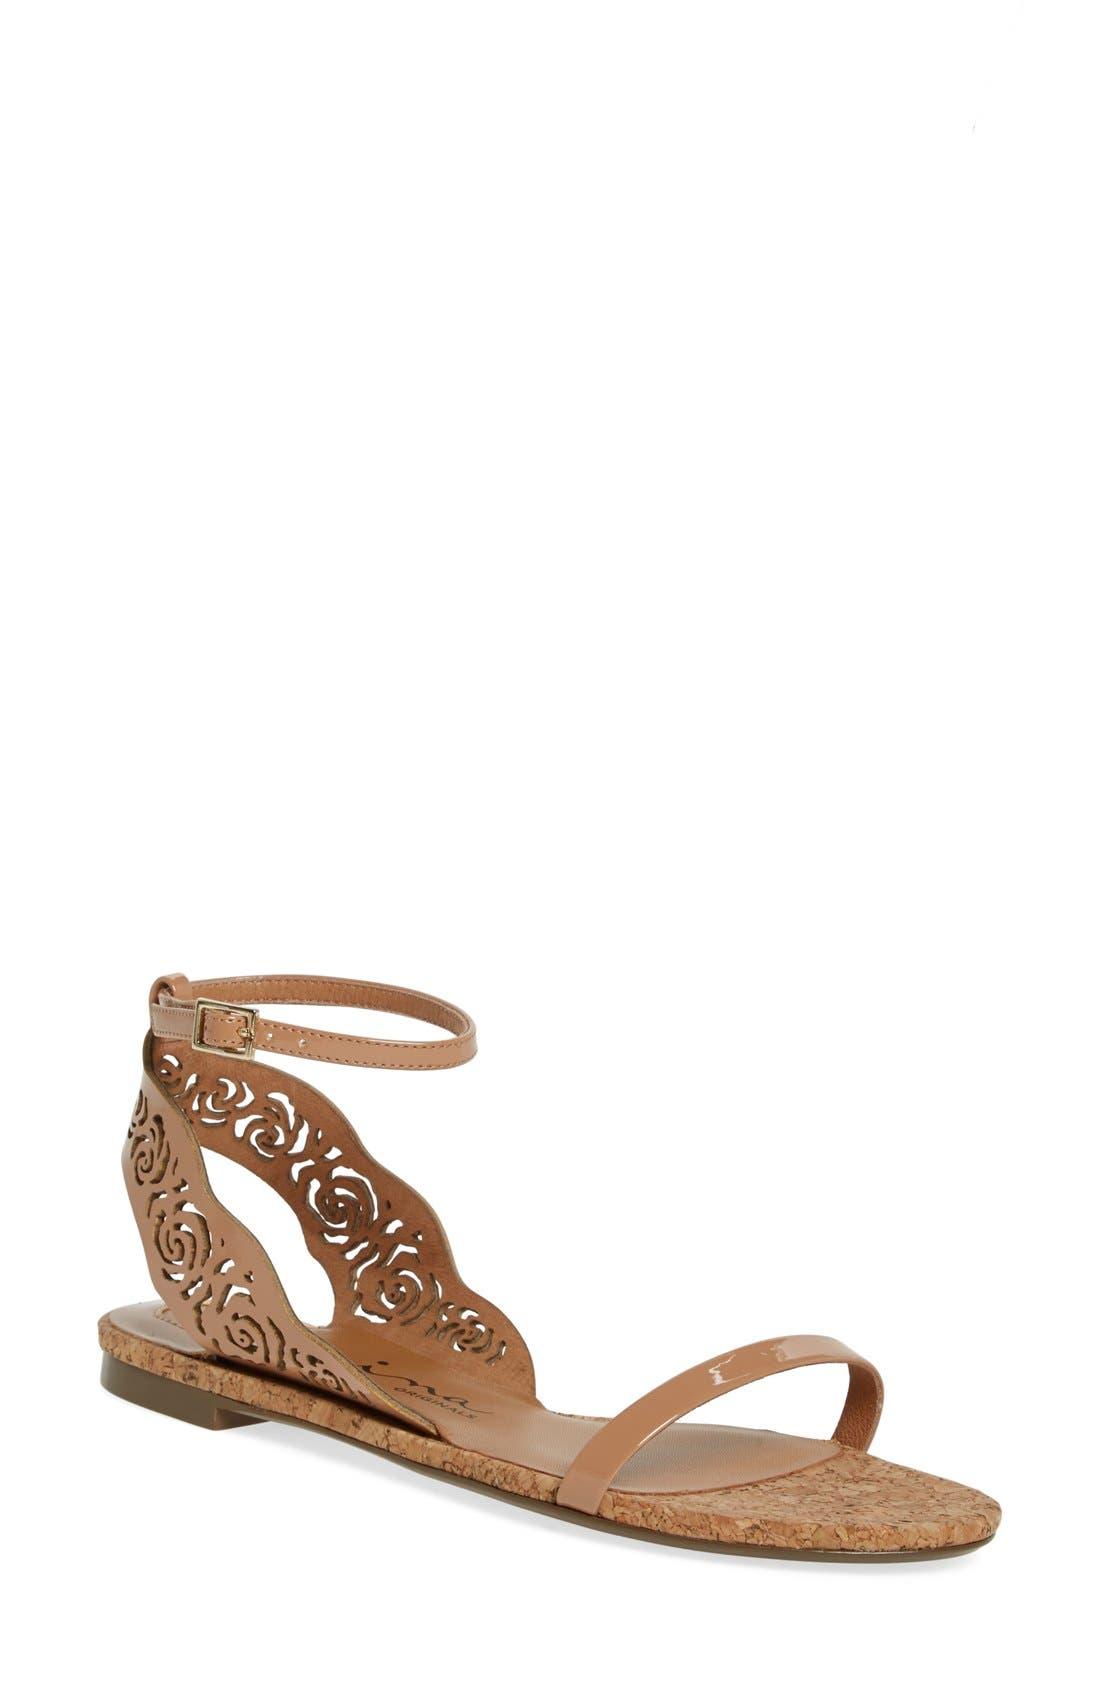 Alternate Image 1 Selected - Nina Originals 'Shiloh' Ankle Strap Sandal (Women)